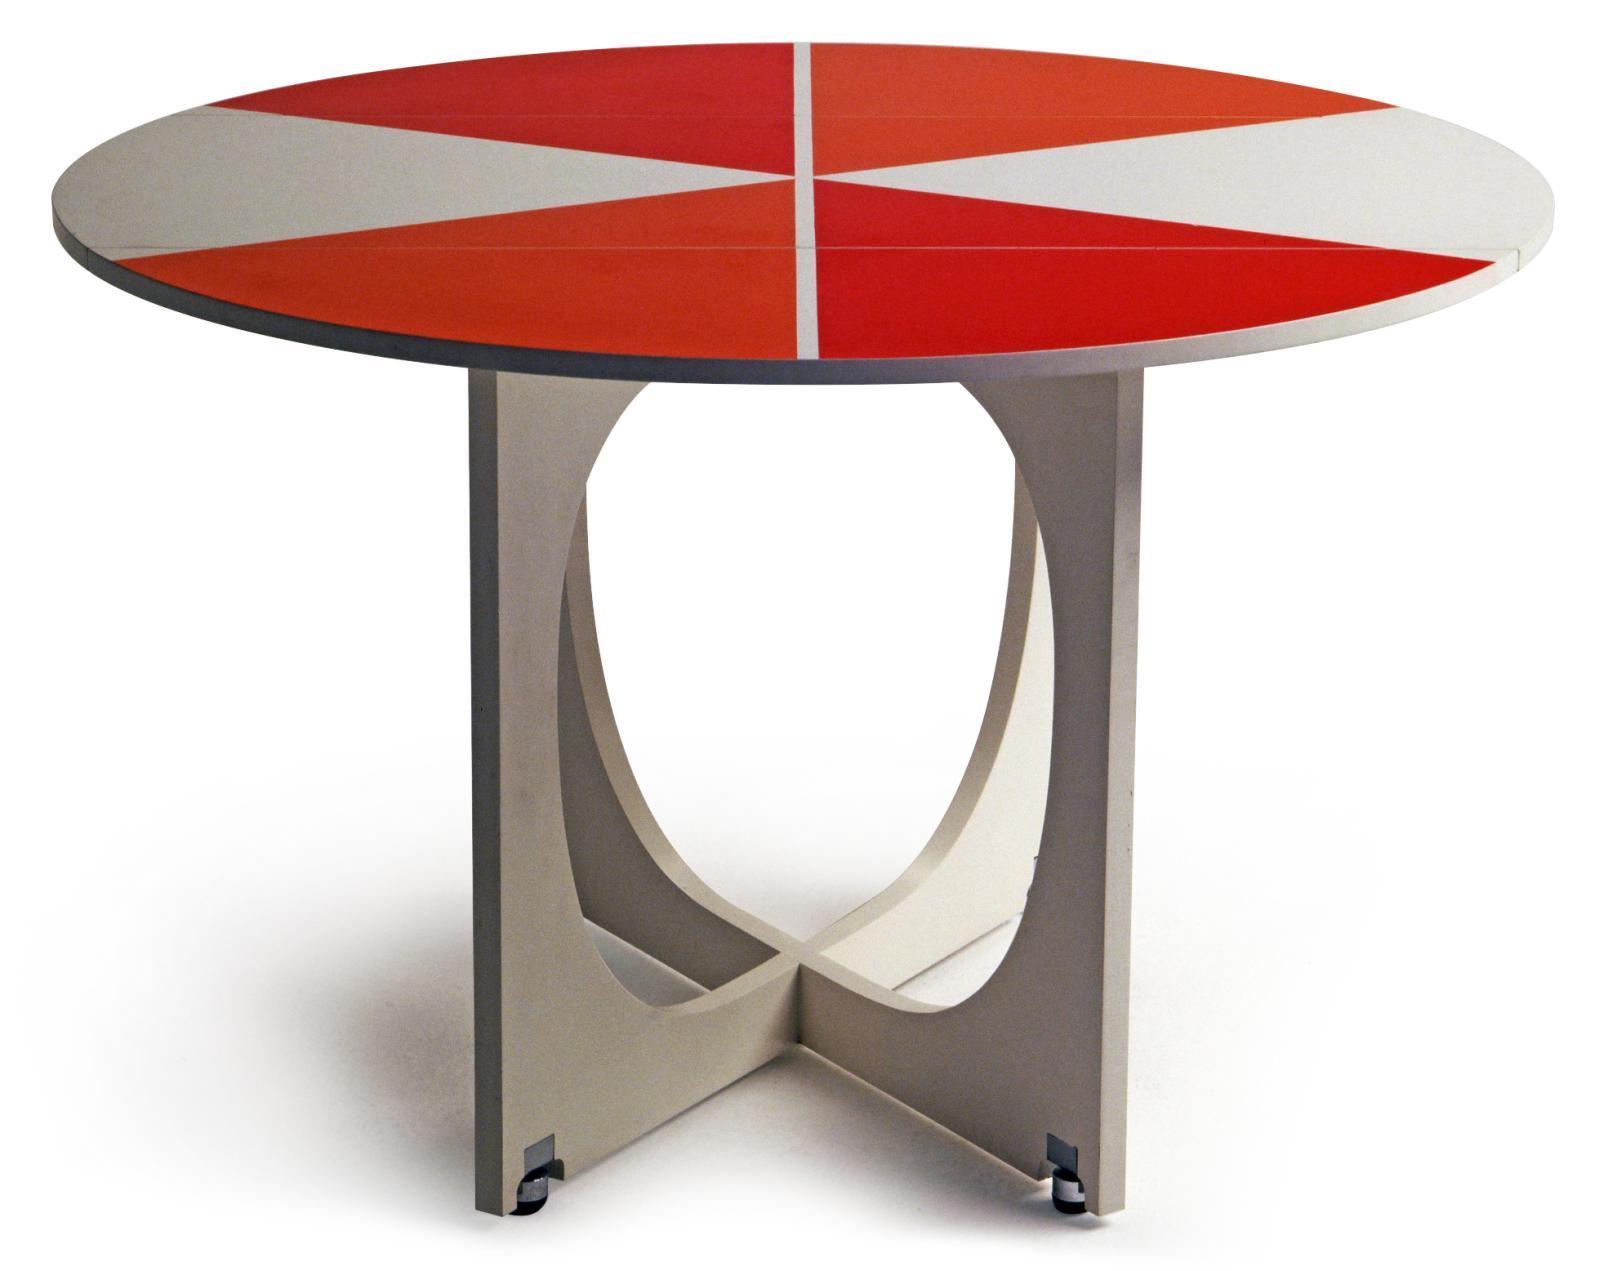 Table pliante Apta en formica, bois et laiton, 1970. Fabricant: Walter Ponti.